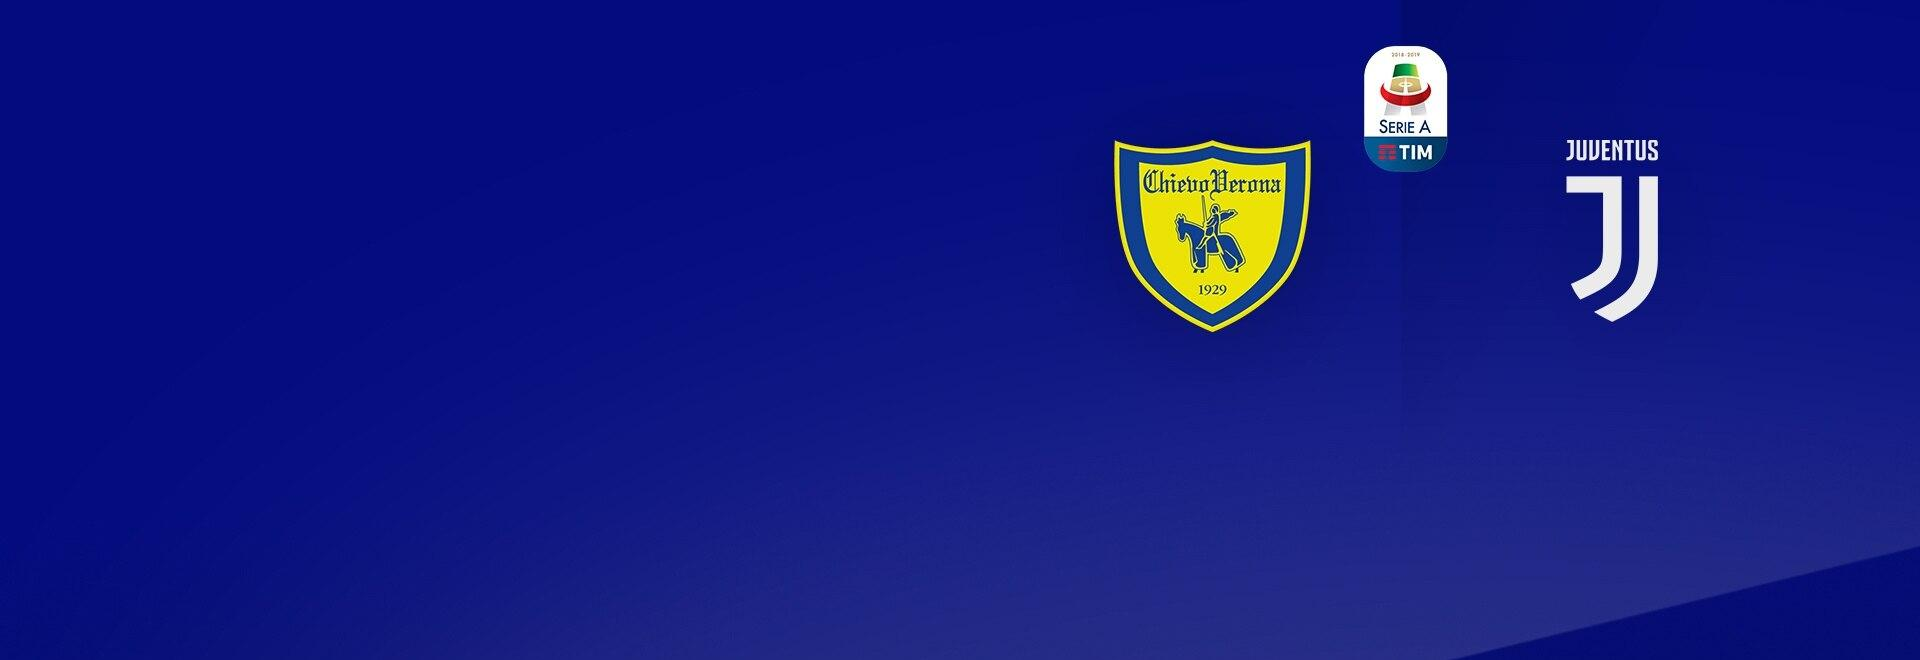 Chievo - Juventus. Ant. 1a g.